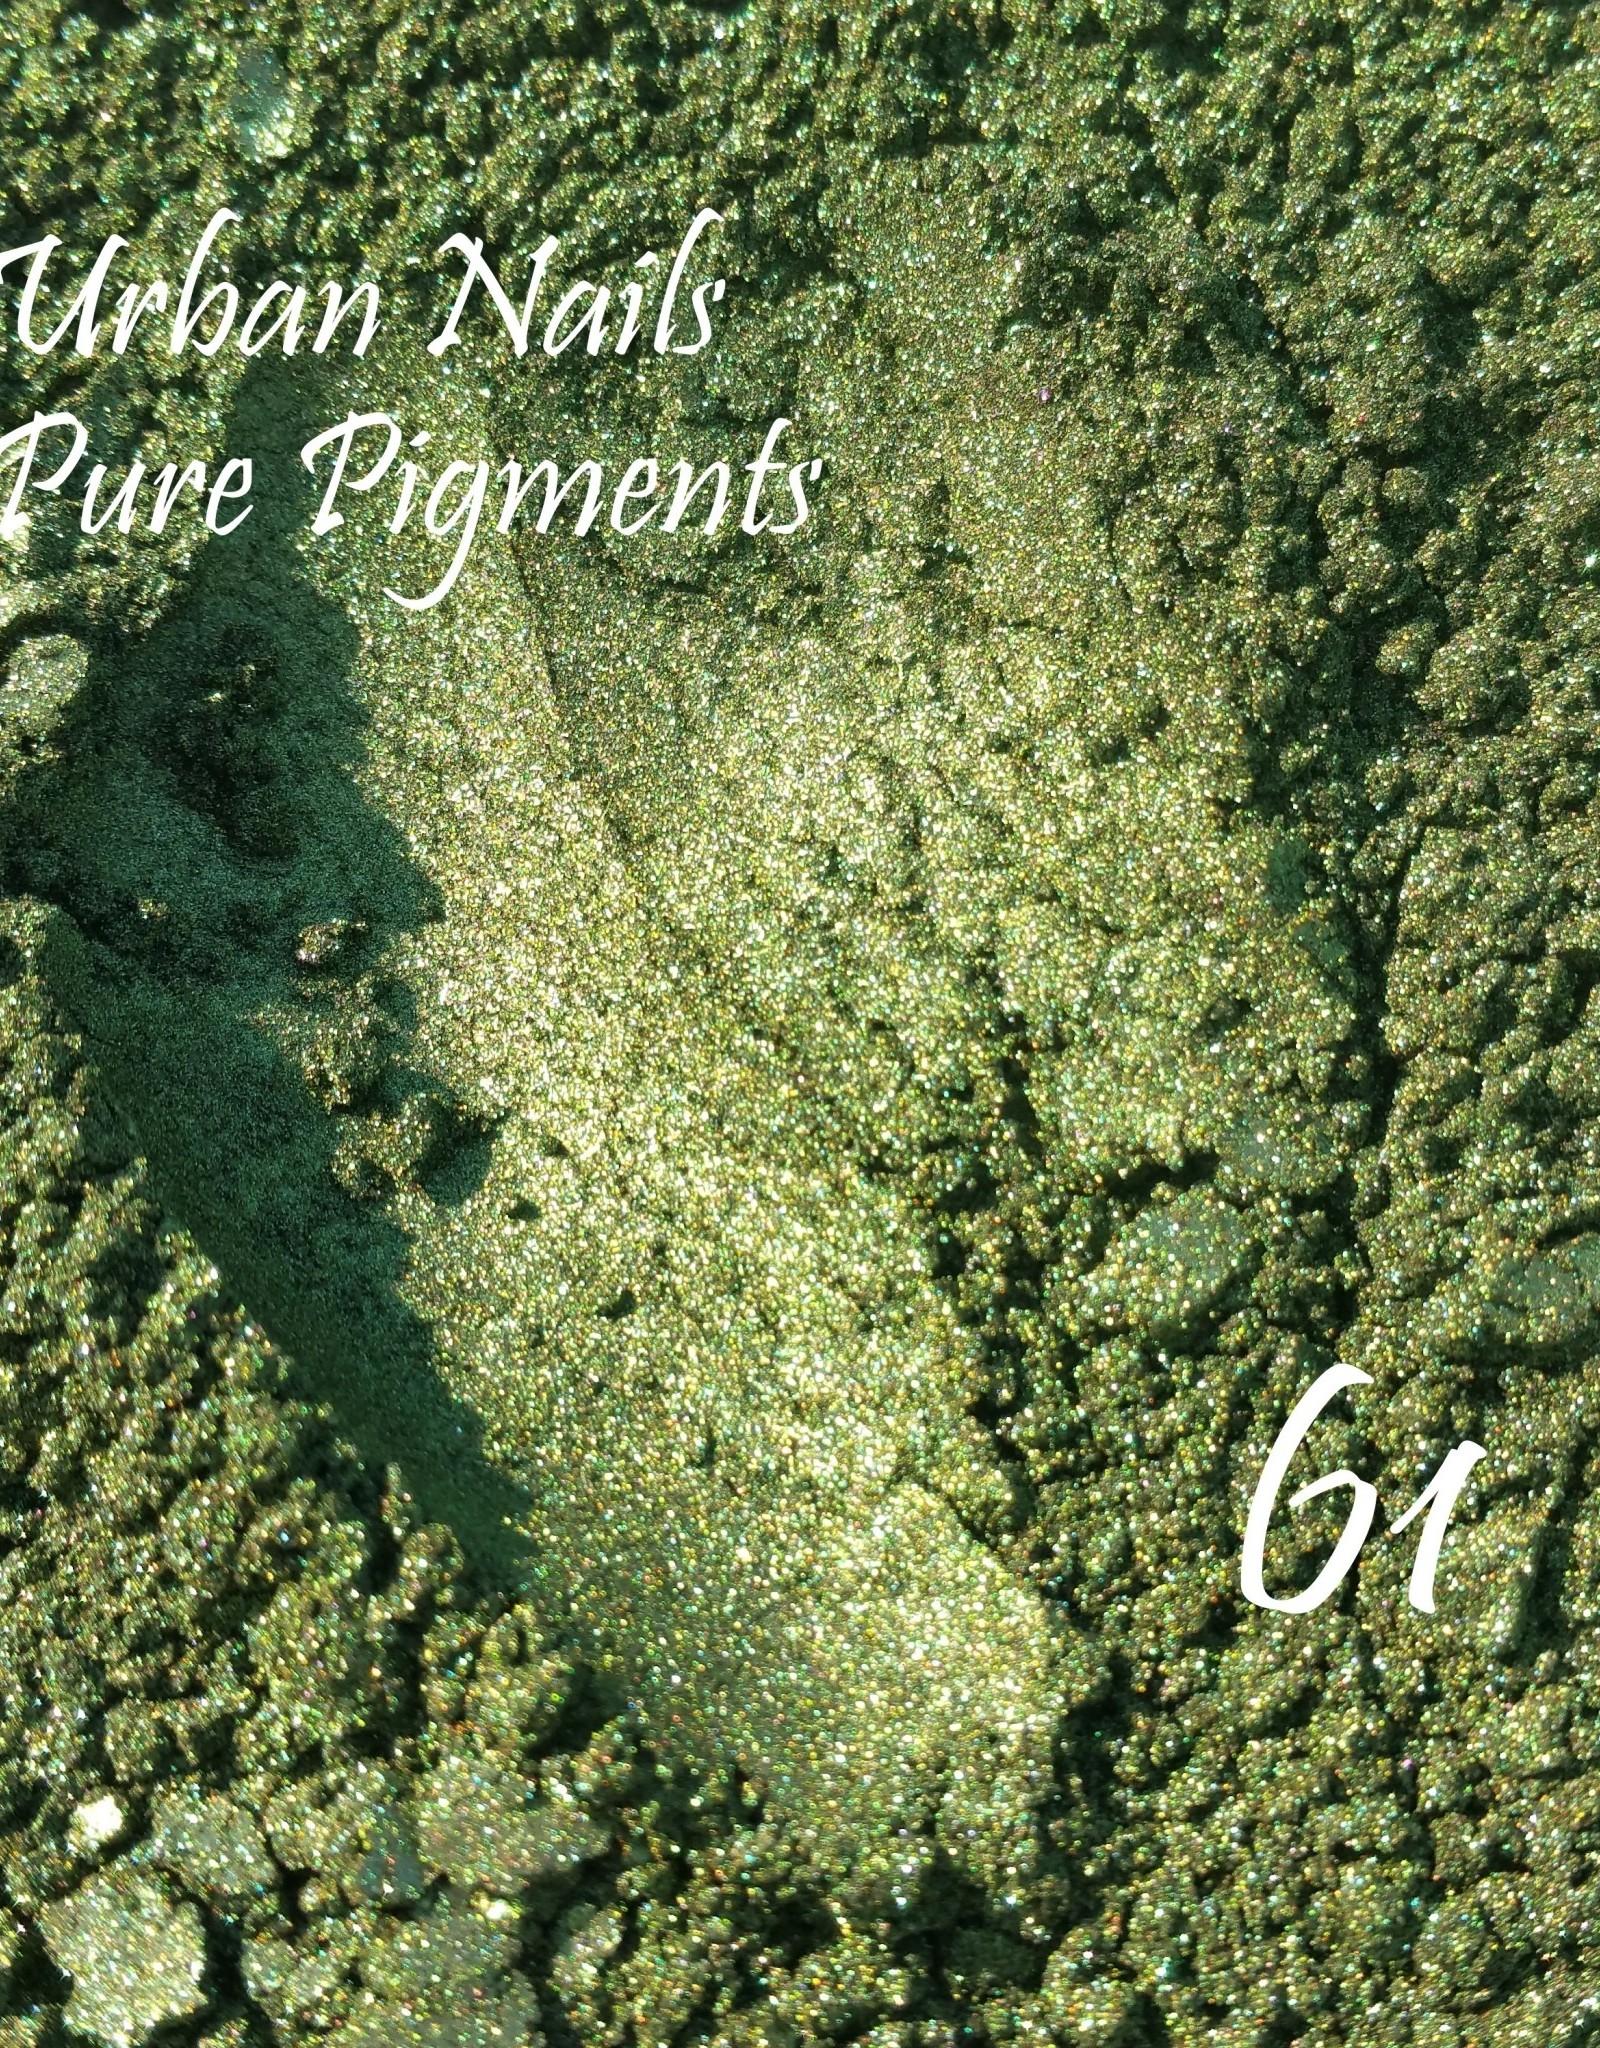 Urban Nails Pure Pigment 61